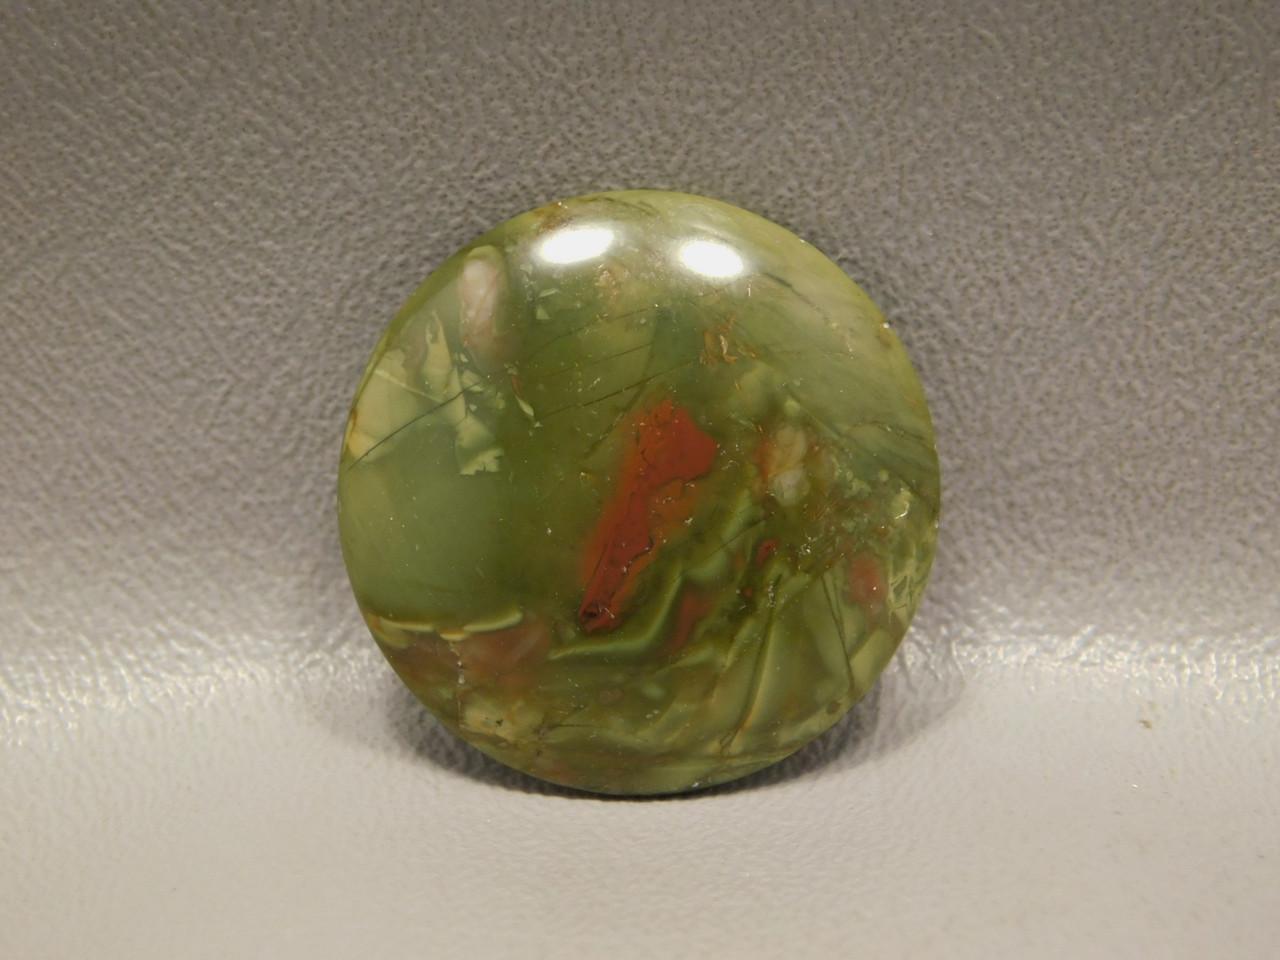 Morrisonite Jasper 31 mm Round Green Loose Stone Cabochon #22